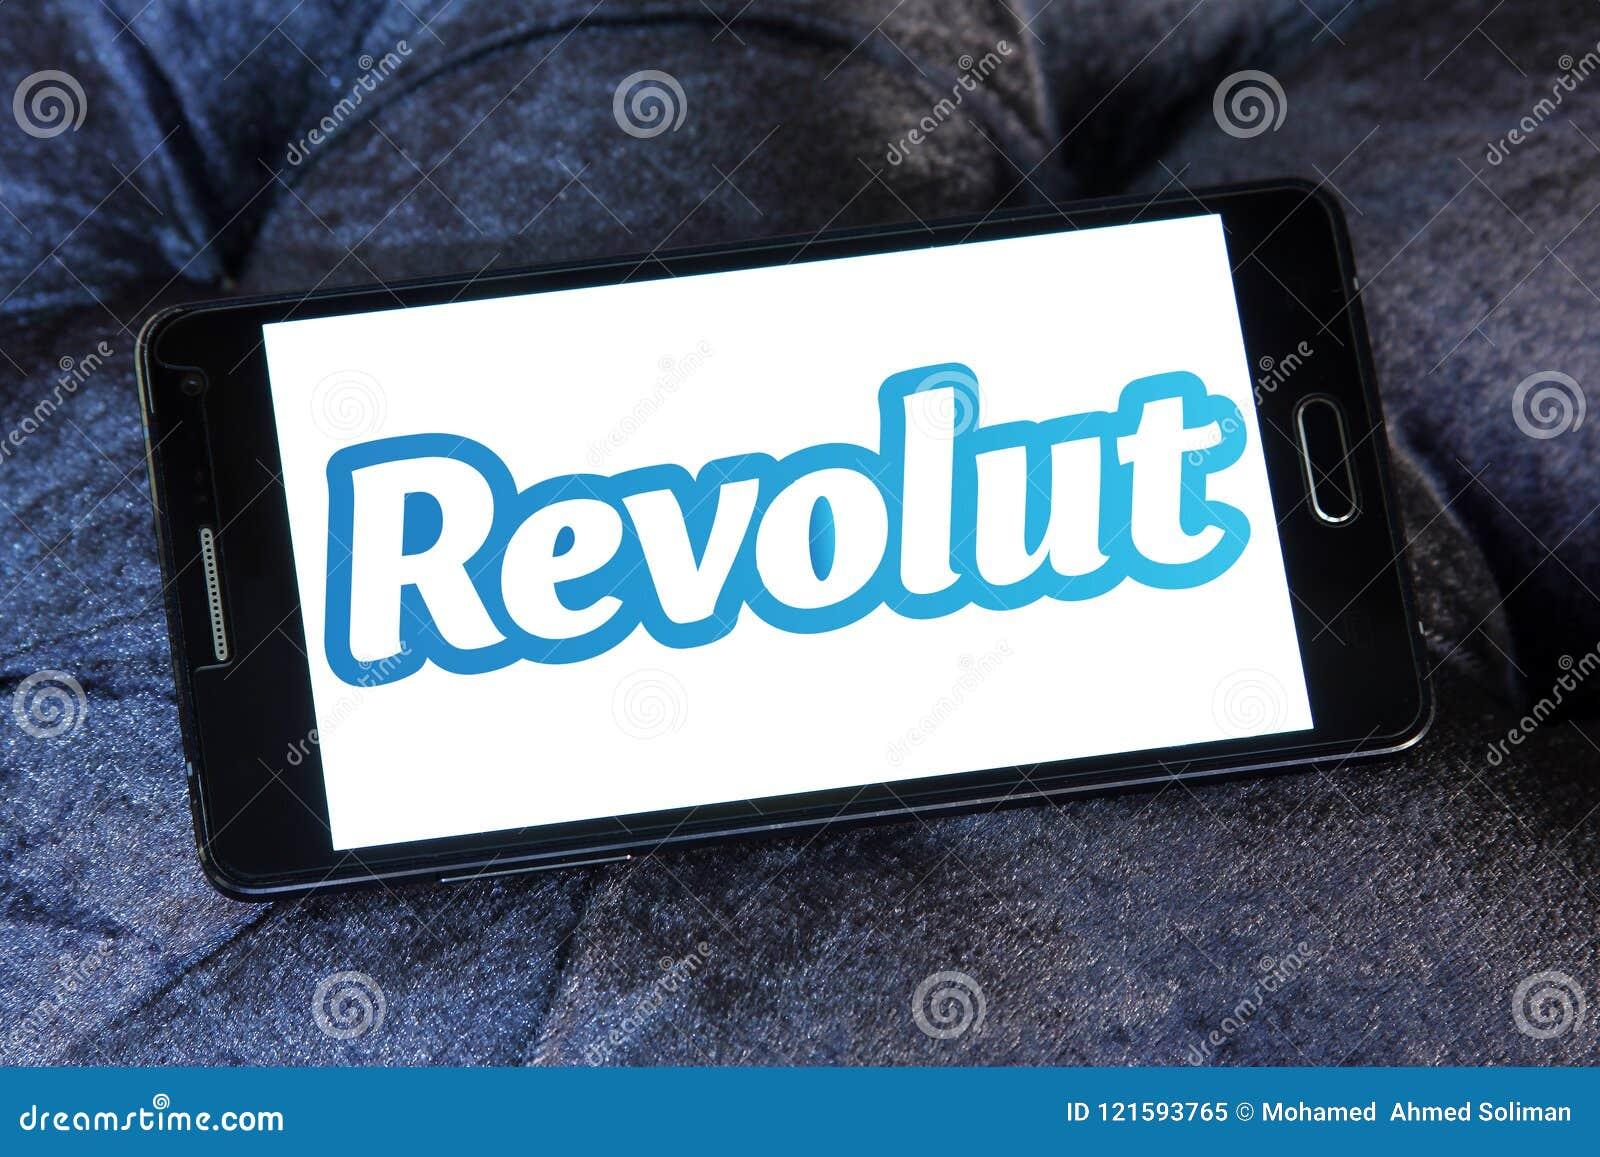 Revolut digital banking logo